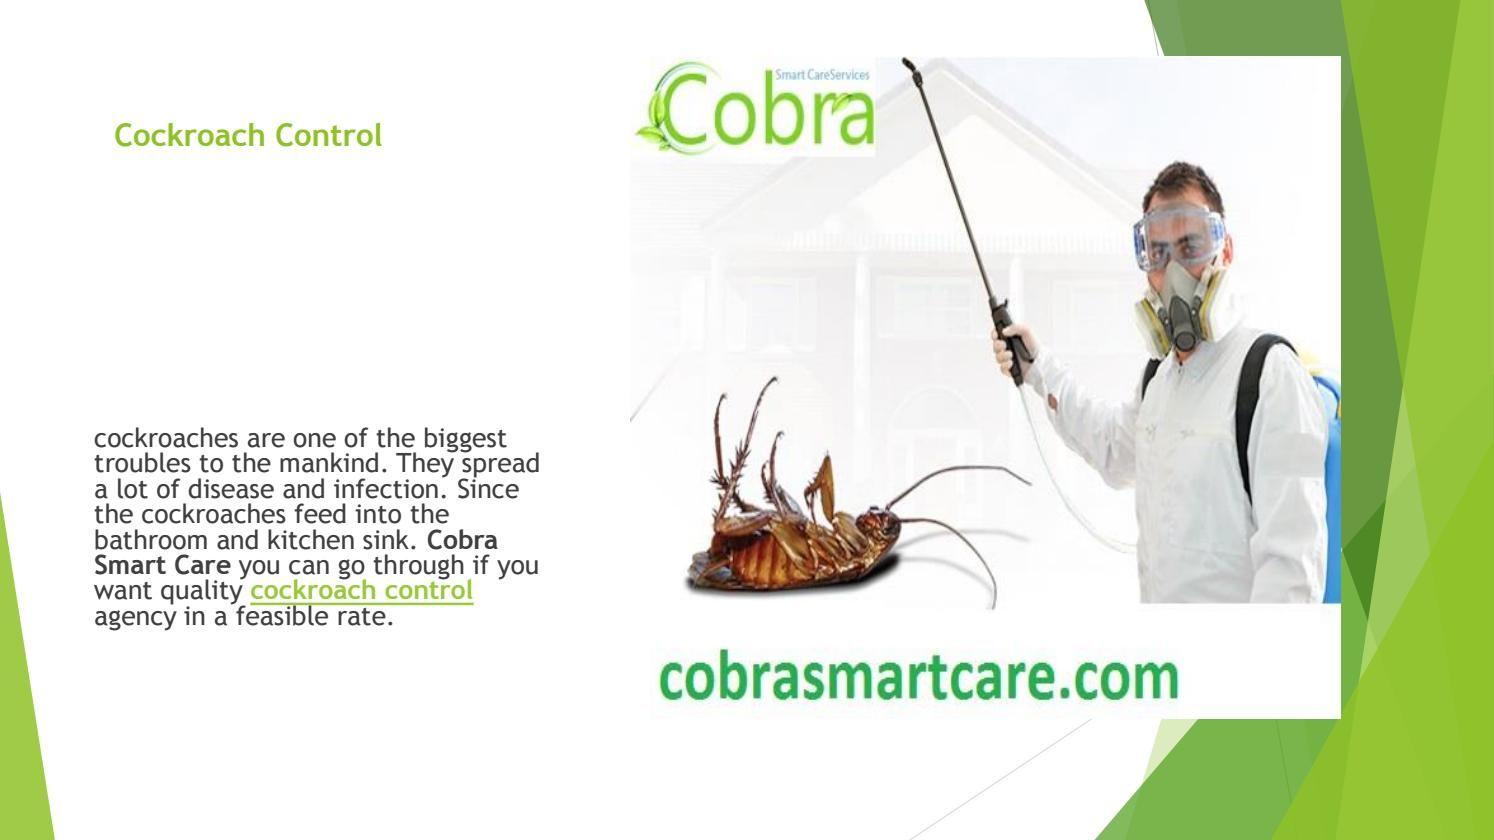 Cobrasmartcare gives service of cockroach control